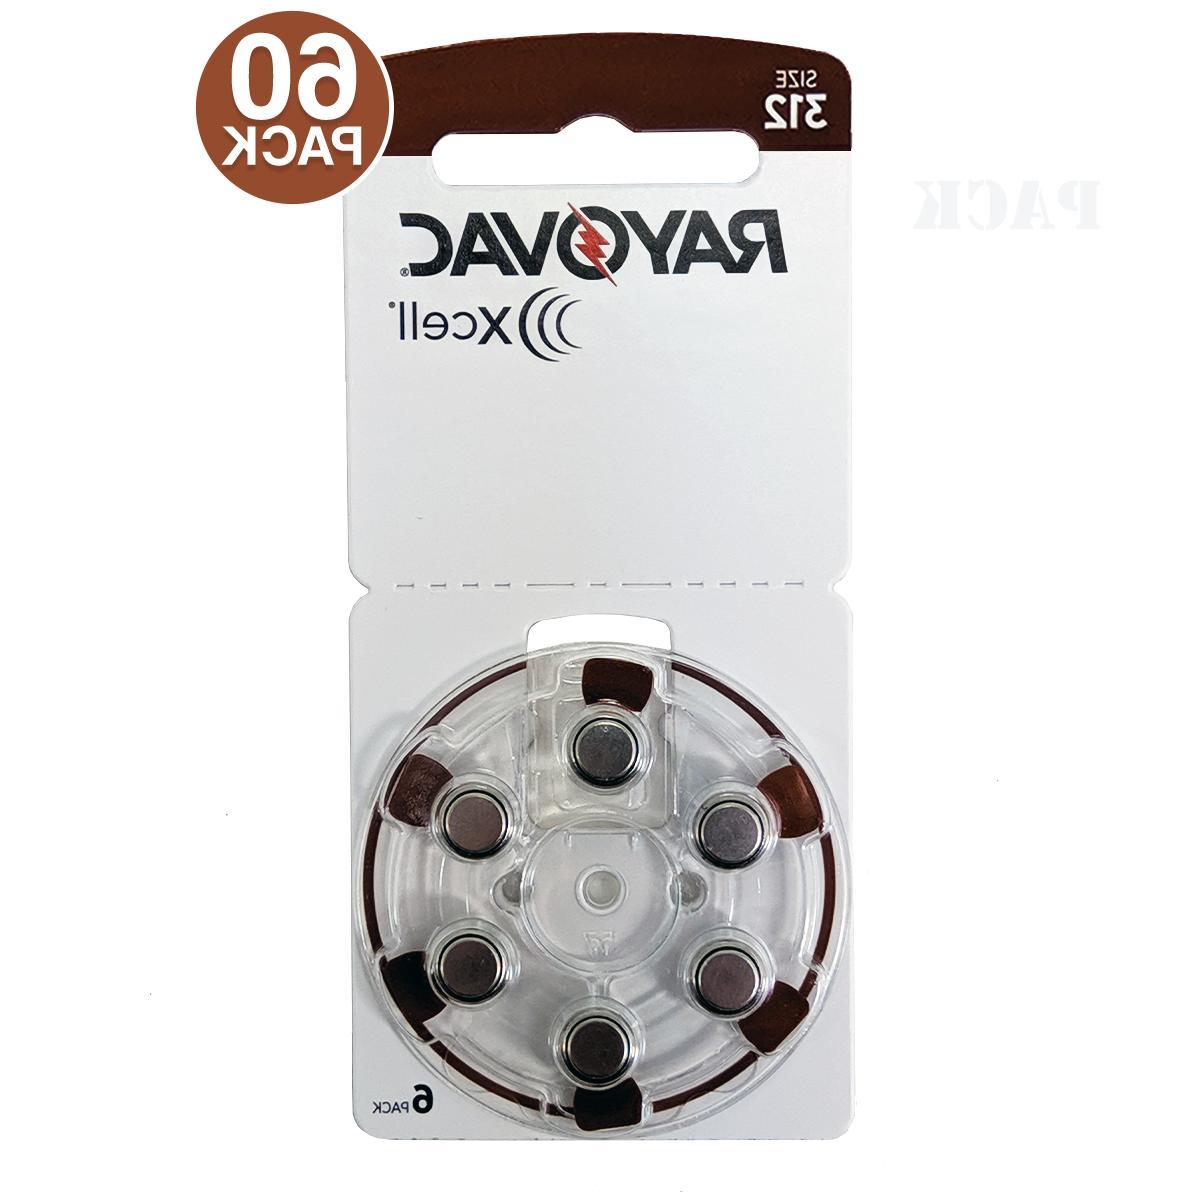 60 rayovac mf hearing aid batteries size